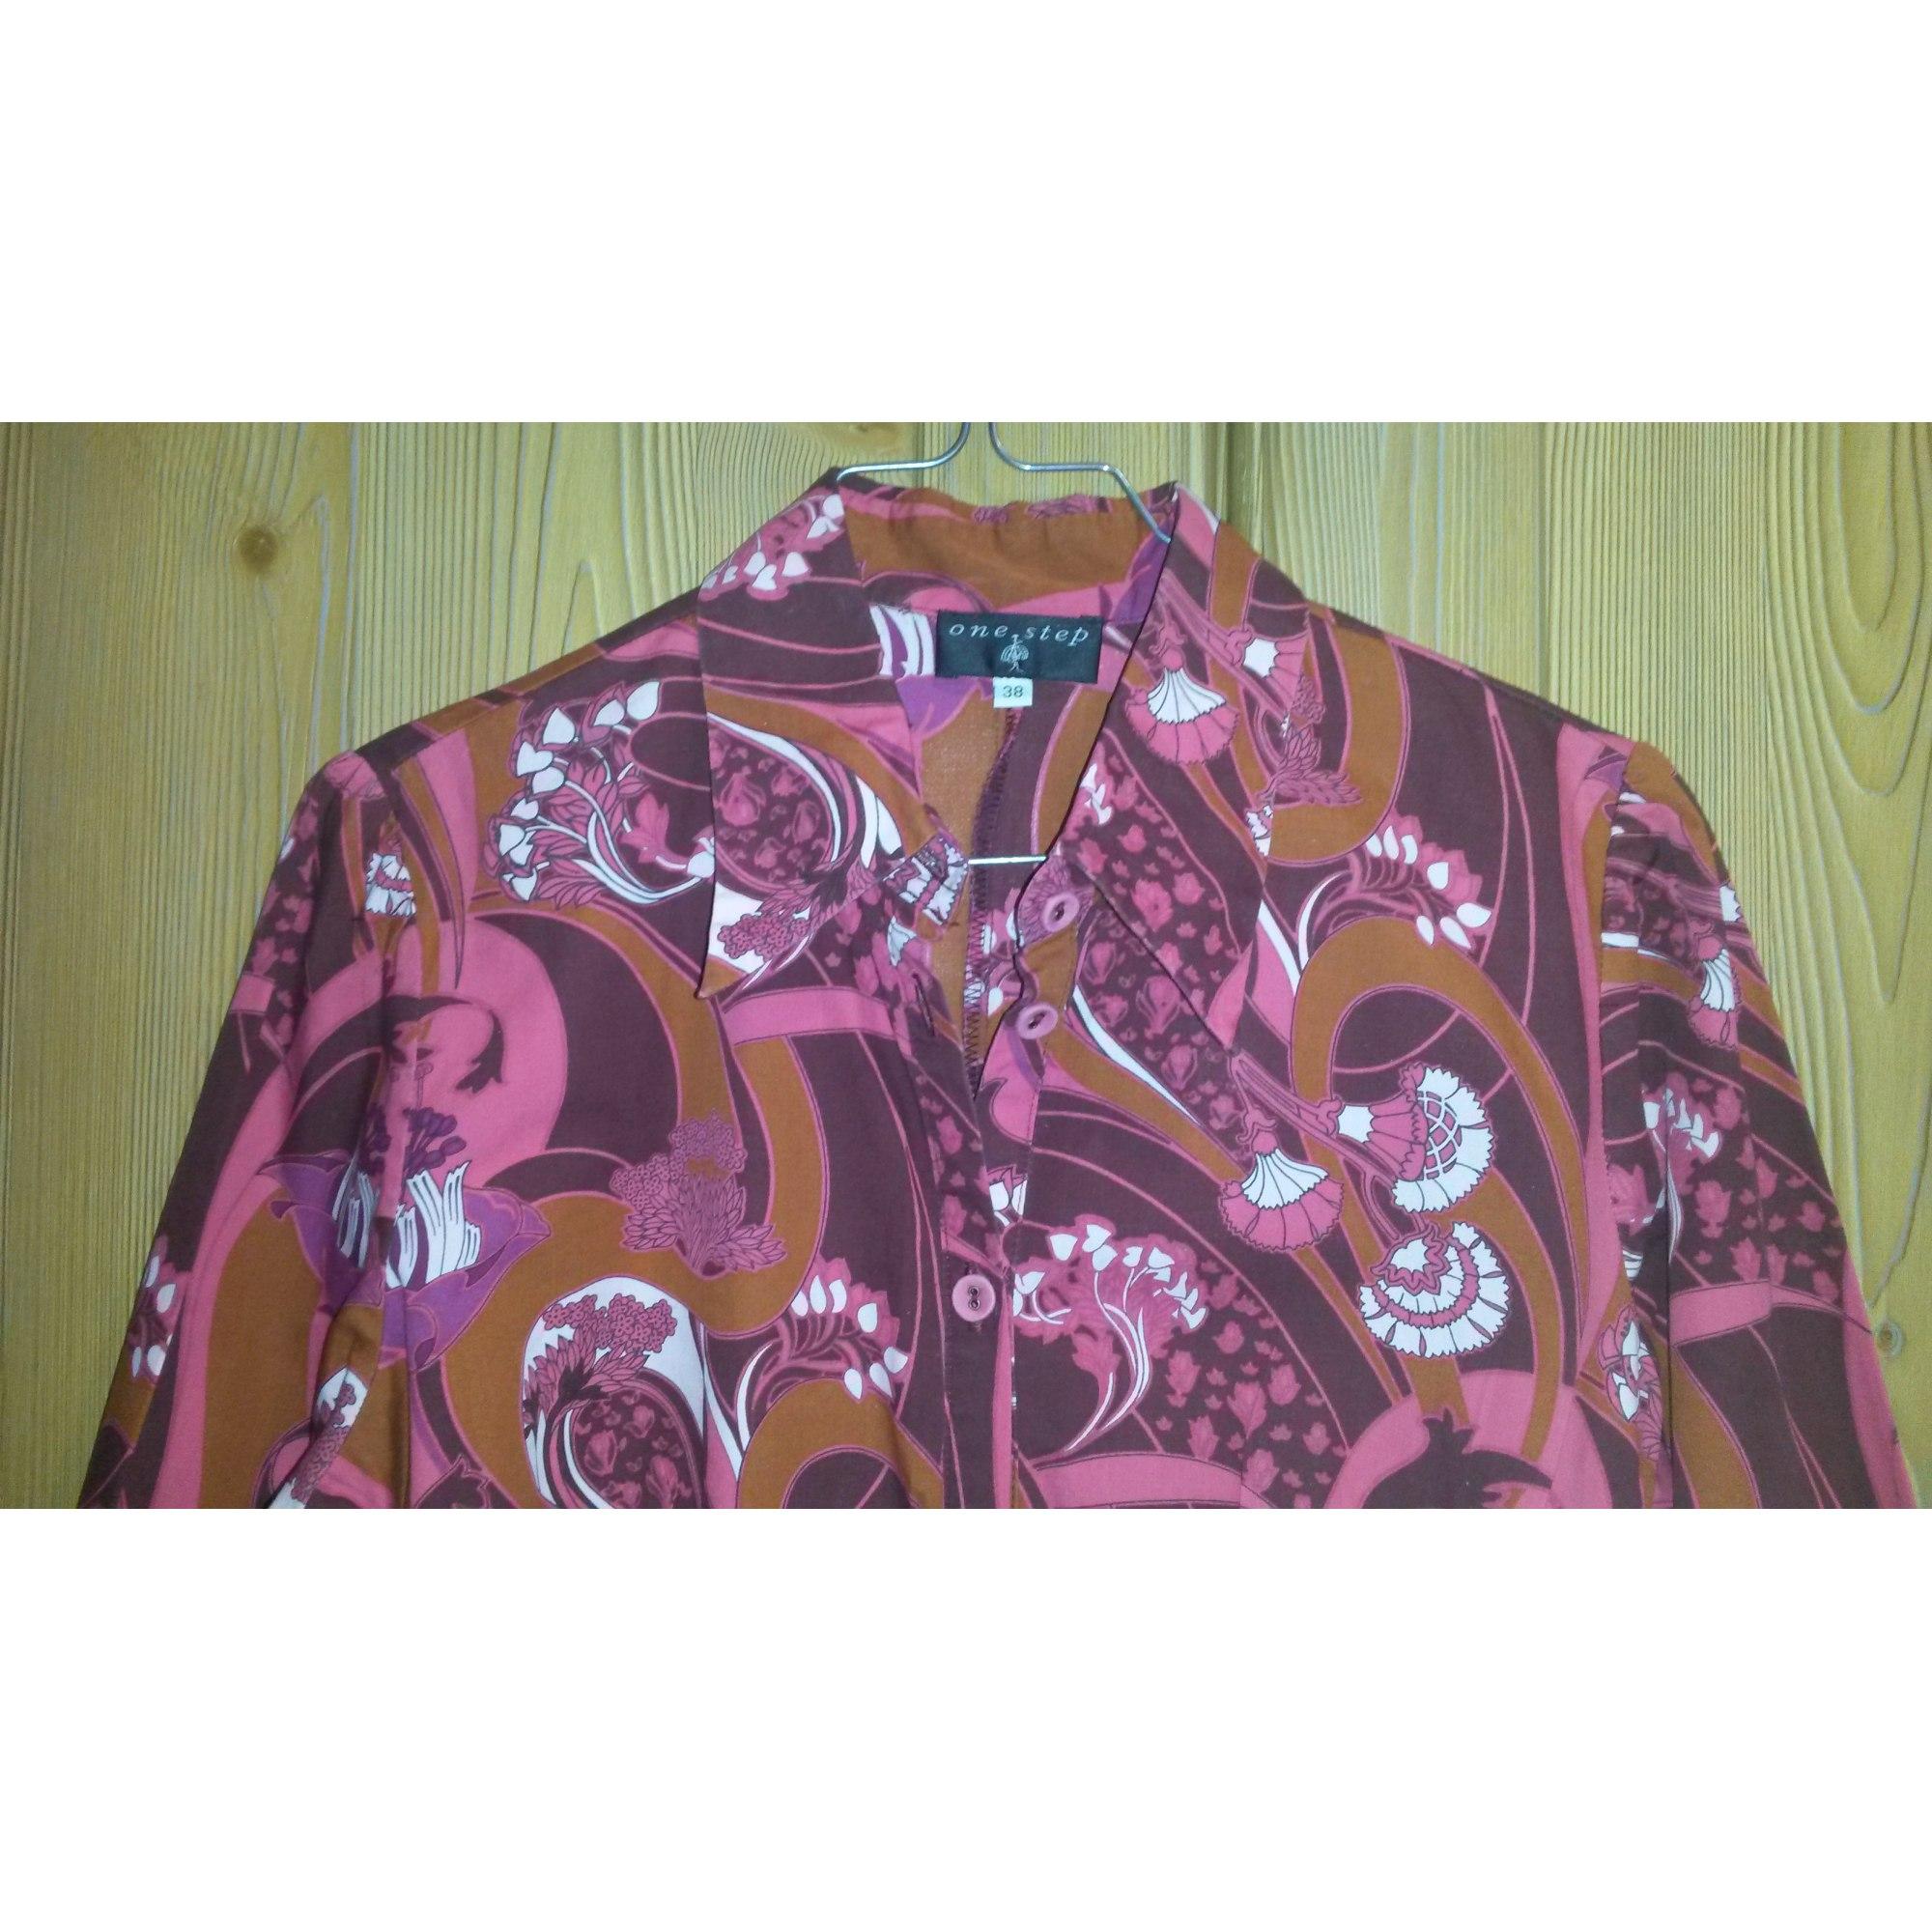 Robe tunique ONE STEP Rose, fuschia, vieux rose